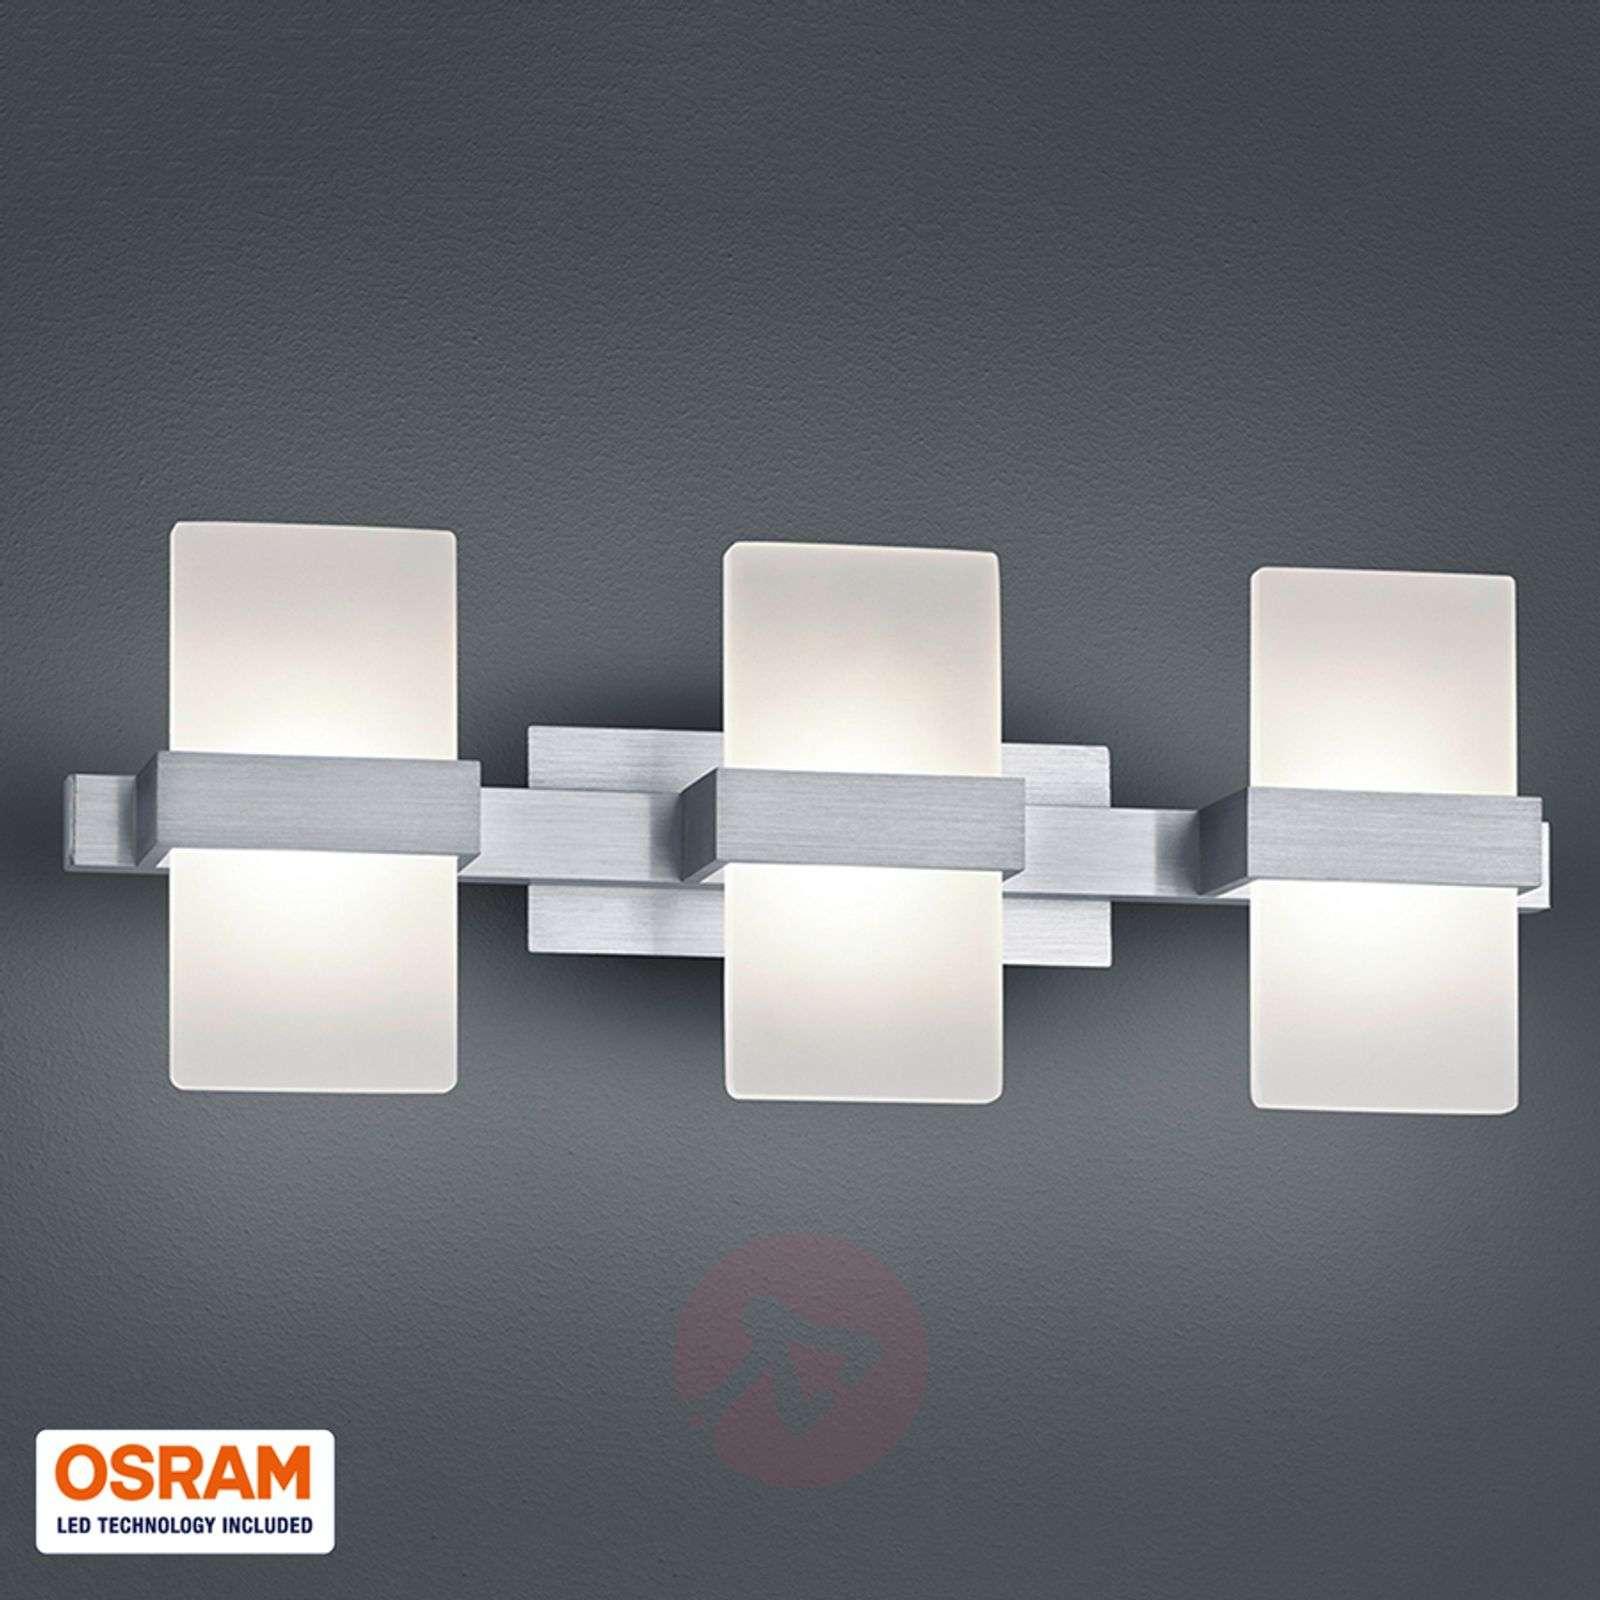 3-bulb LED wall light Platon-9005184-02